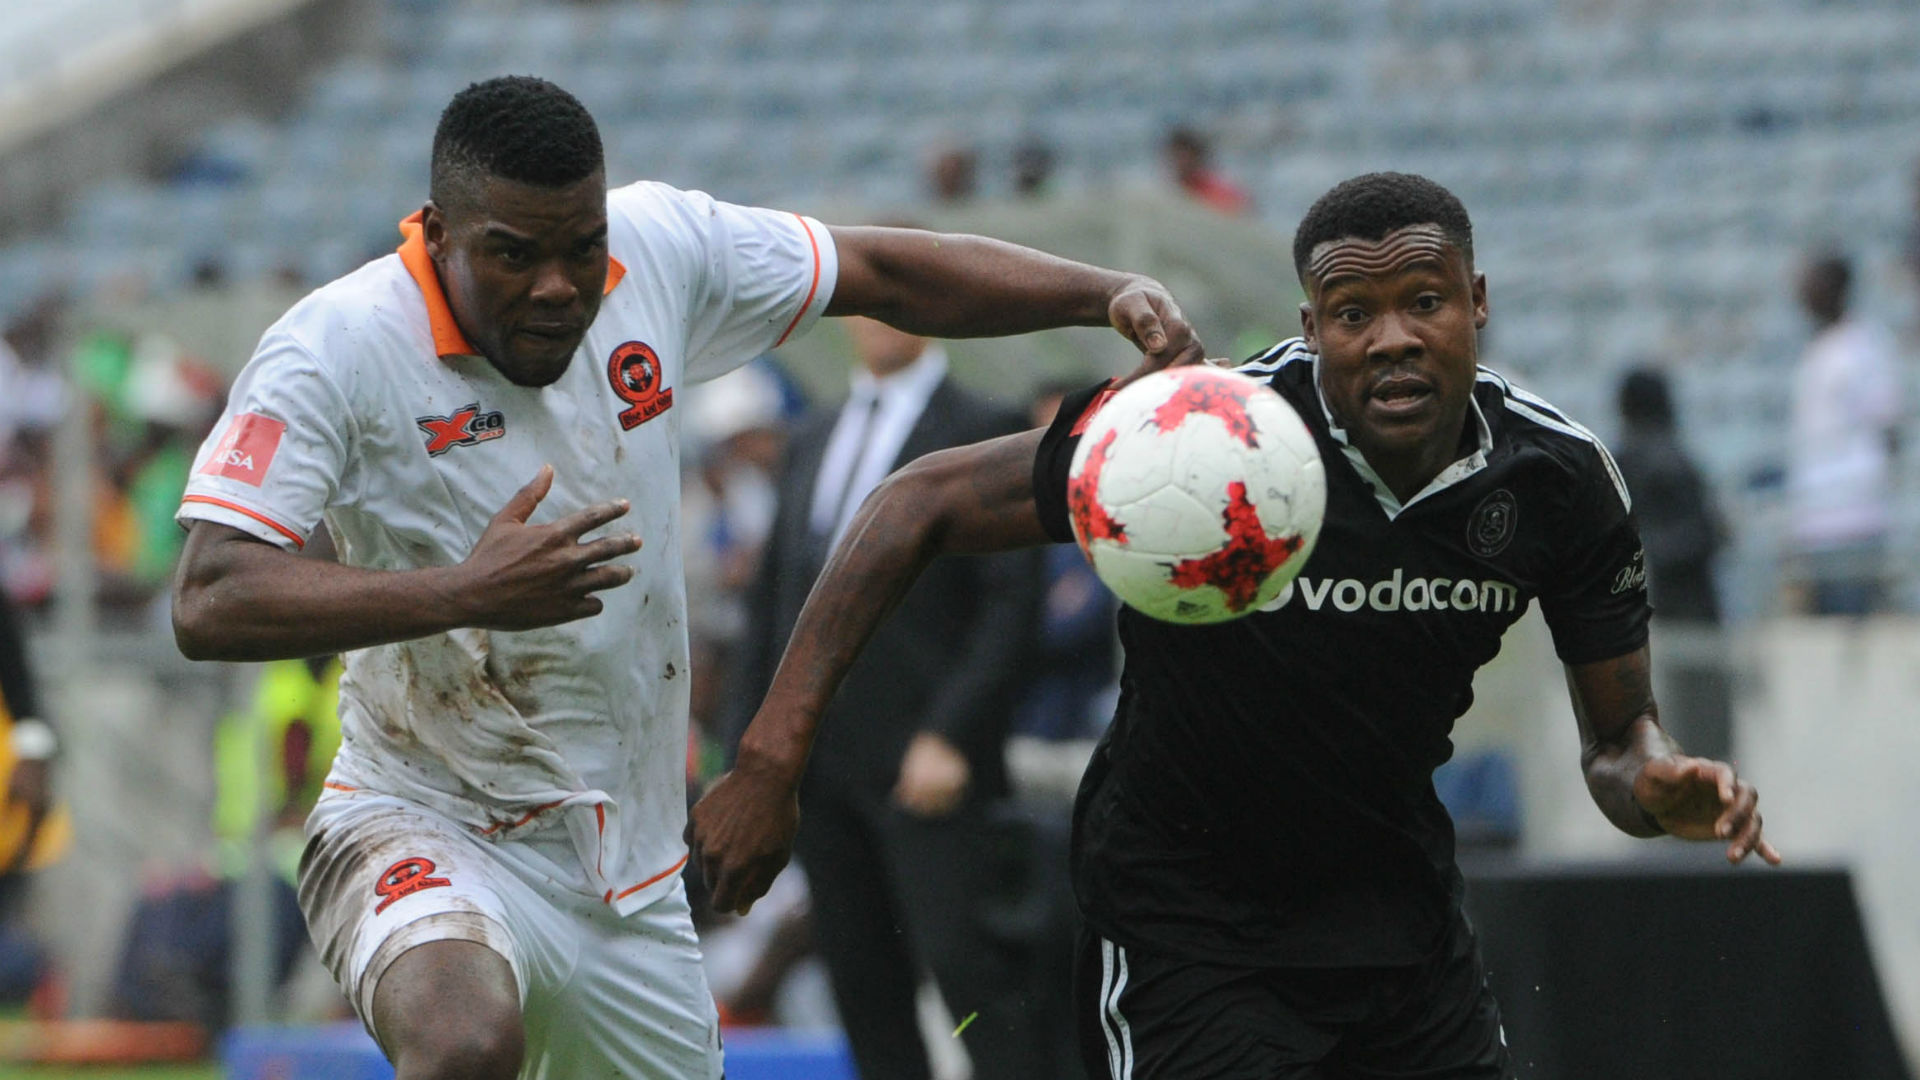 Thamsanqa Gabuza of Orlando Pirates vs Polokwane City